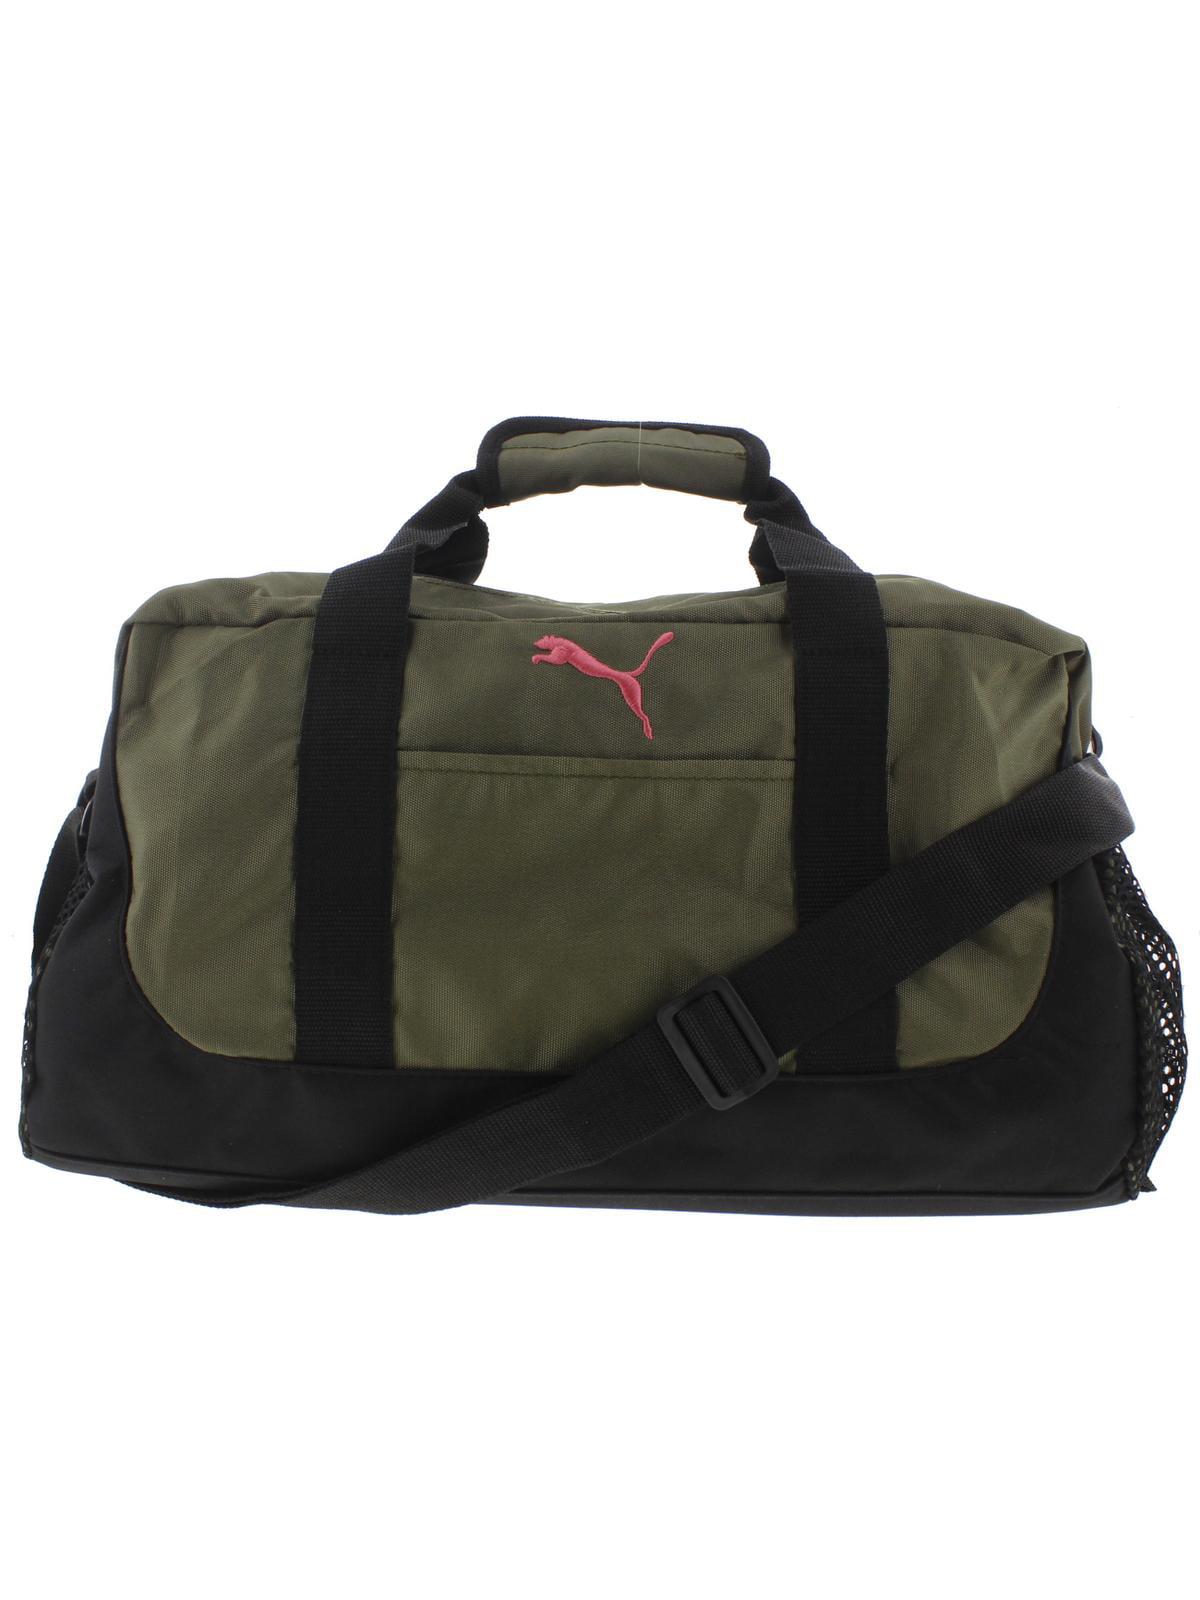 Puma womens evercat interval convertible logo duffle bag walmart duffel bags  jpg 1200x1600 Large duffle bags 8599edae79